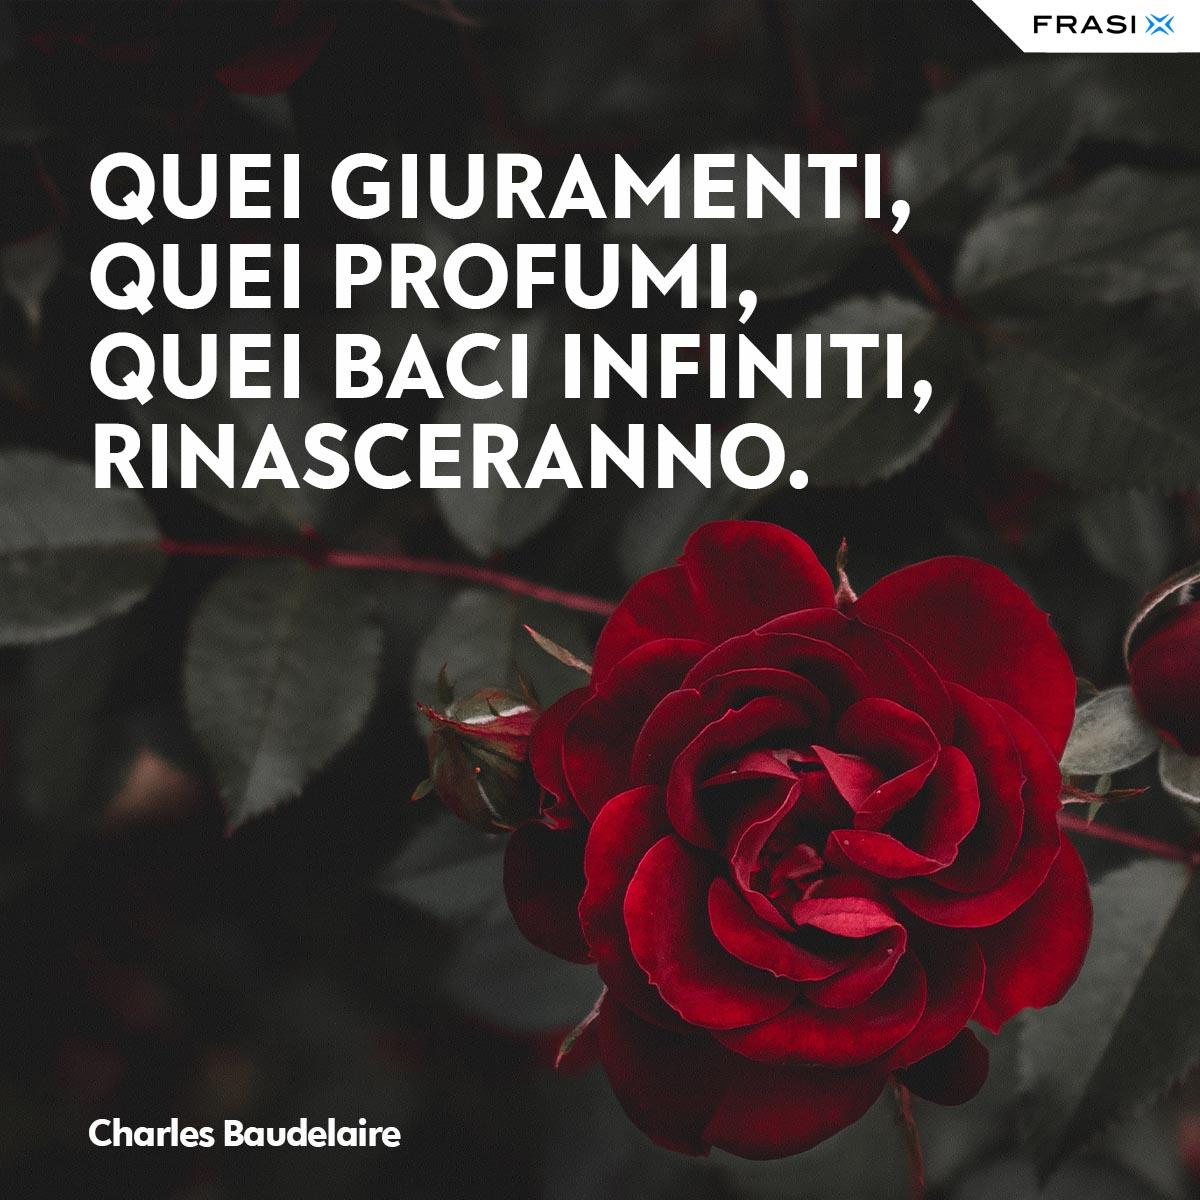 Frasi tumblr Chales Baudelaire